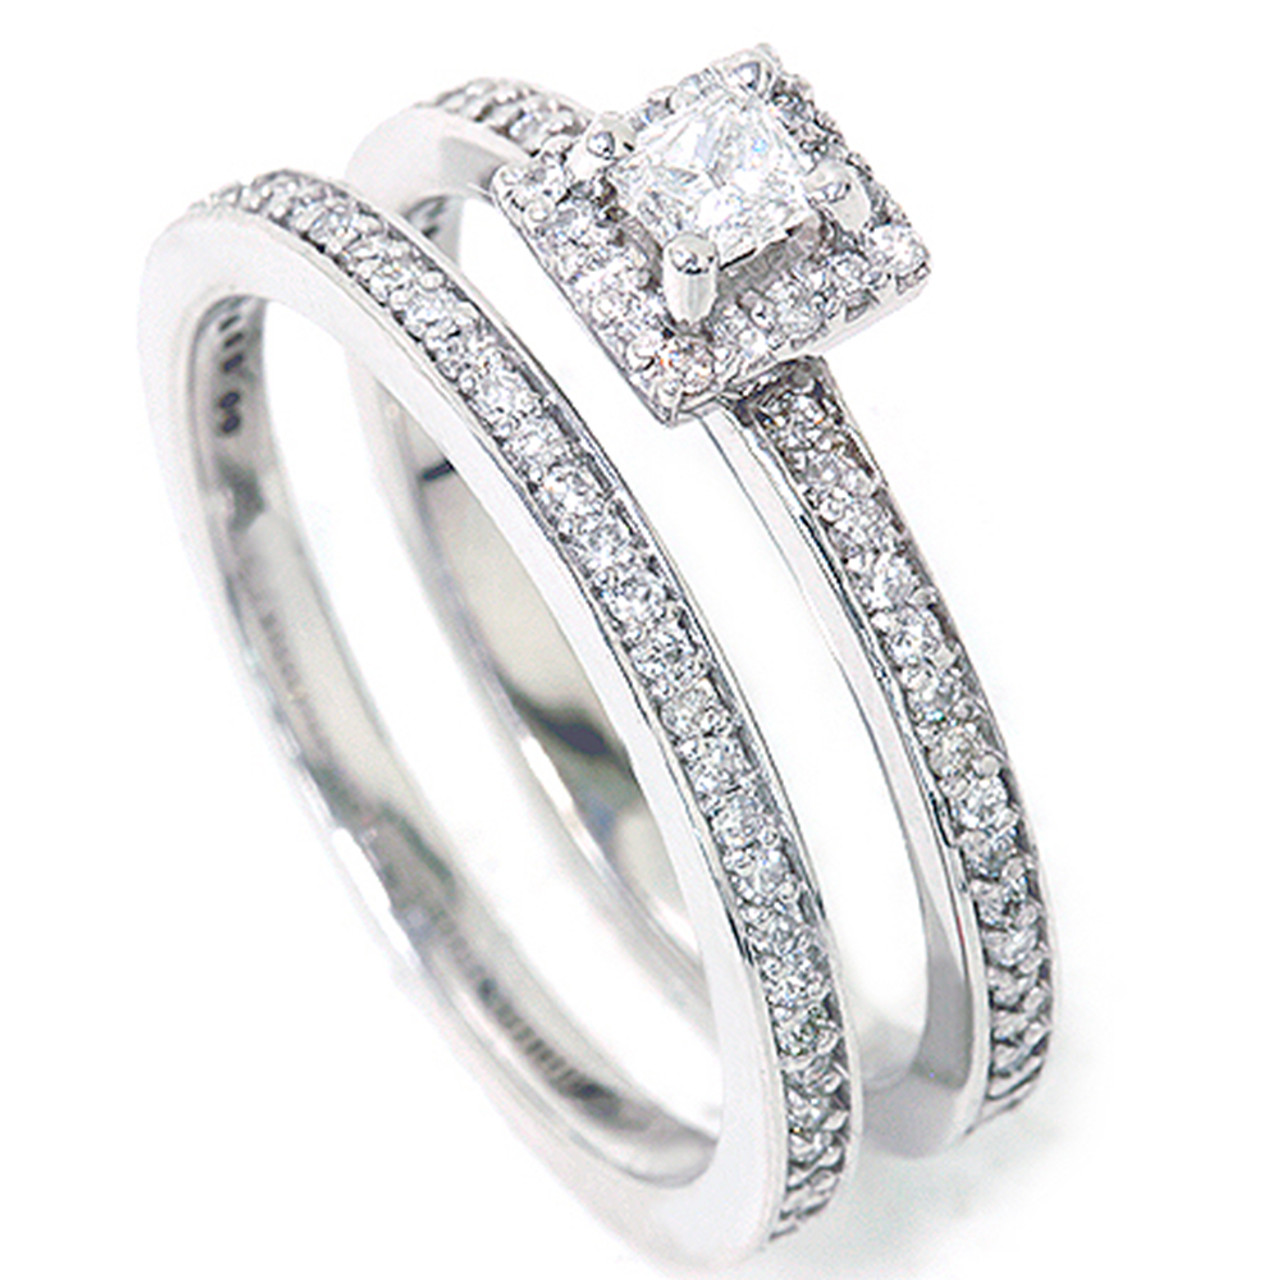 3b4085da4 5/8Ct Princess Cut Diamond Engagement Matching Wedding Halo Ring Set White  Gold